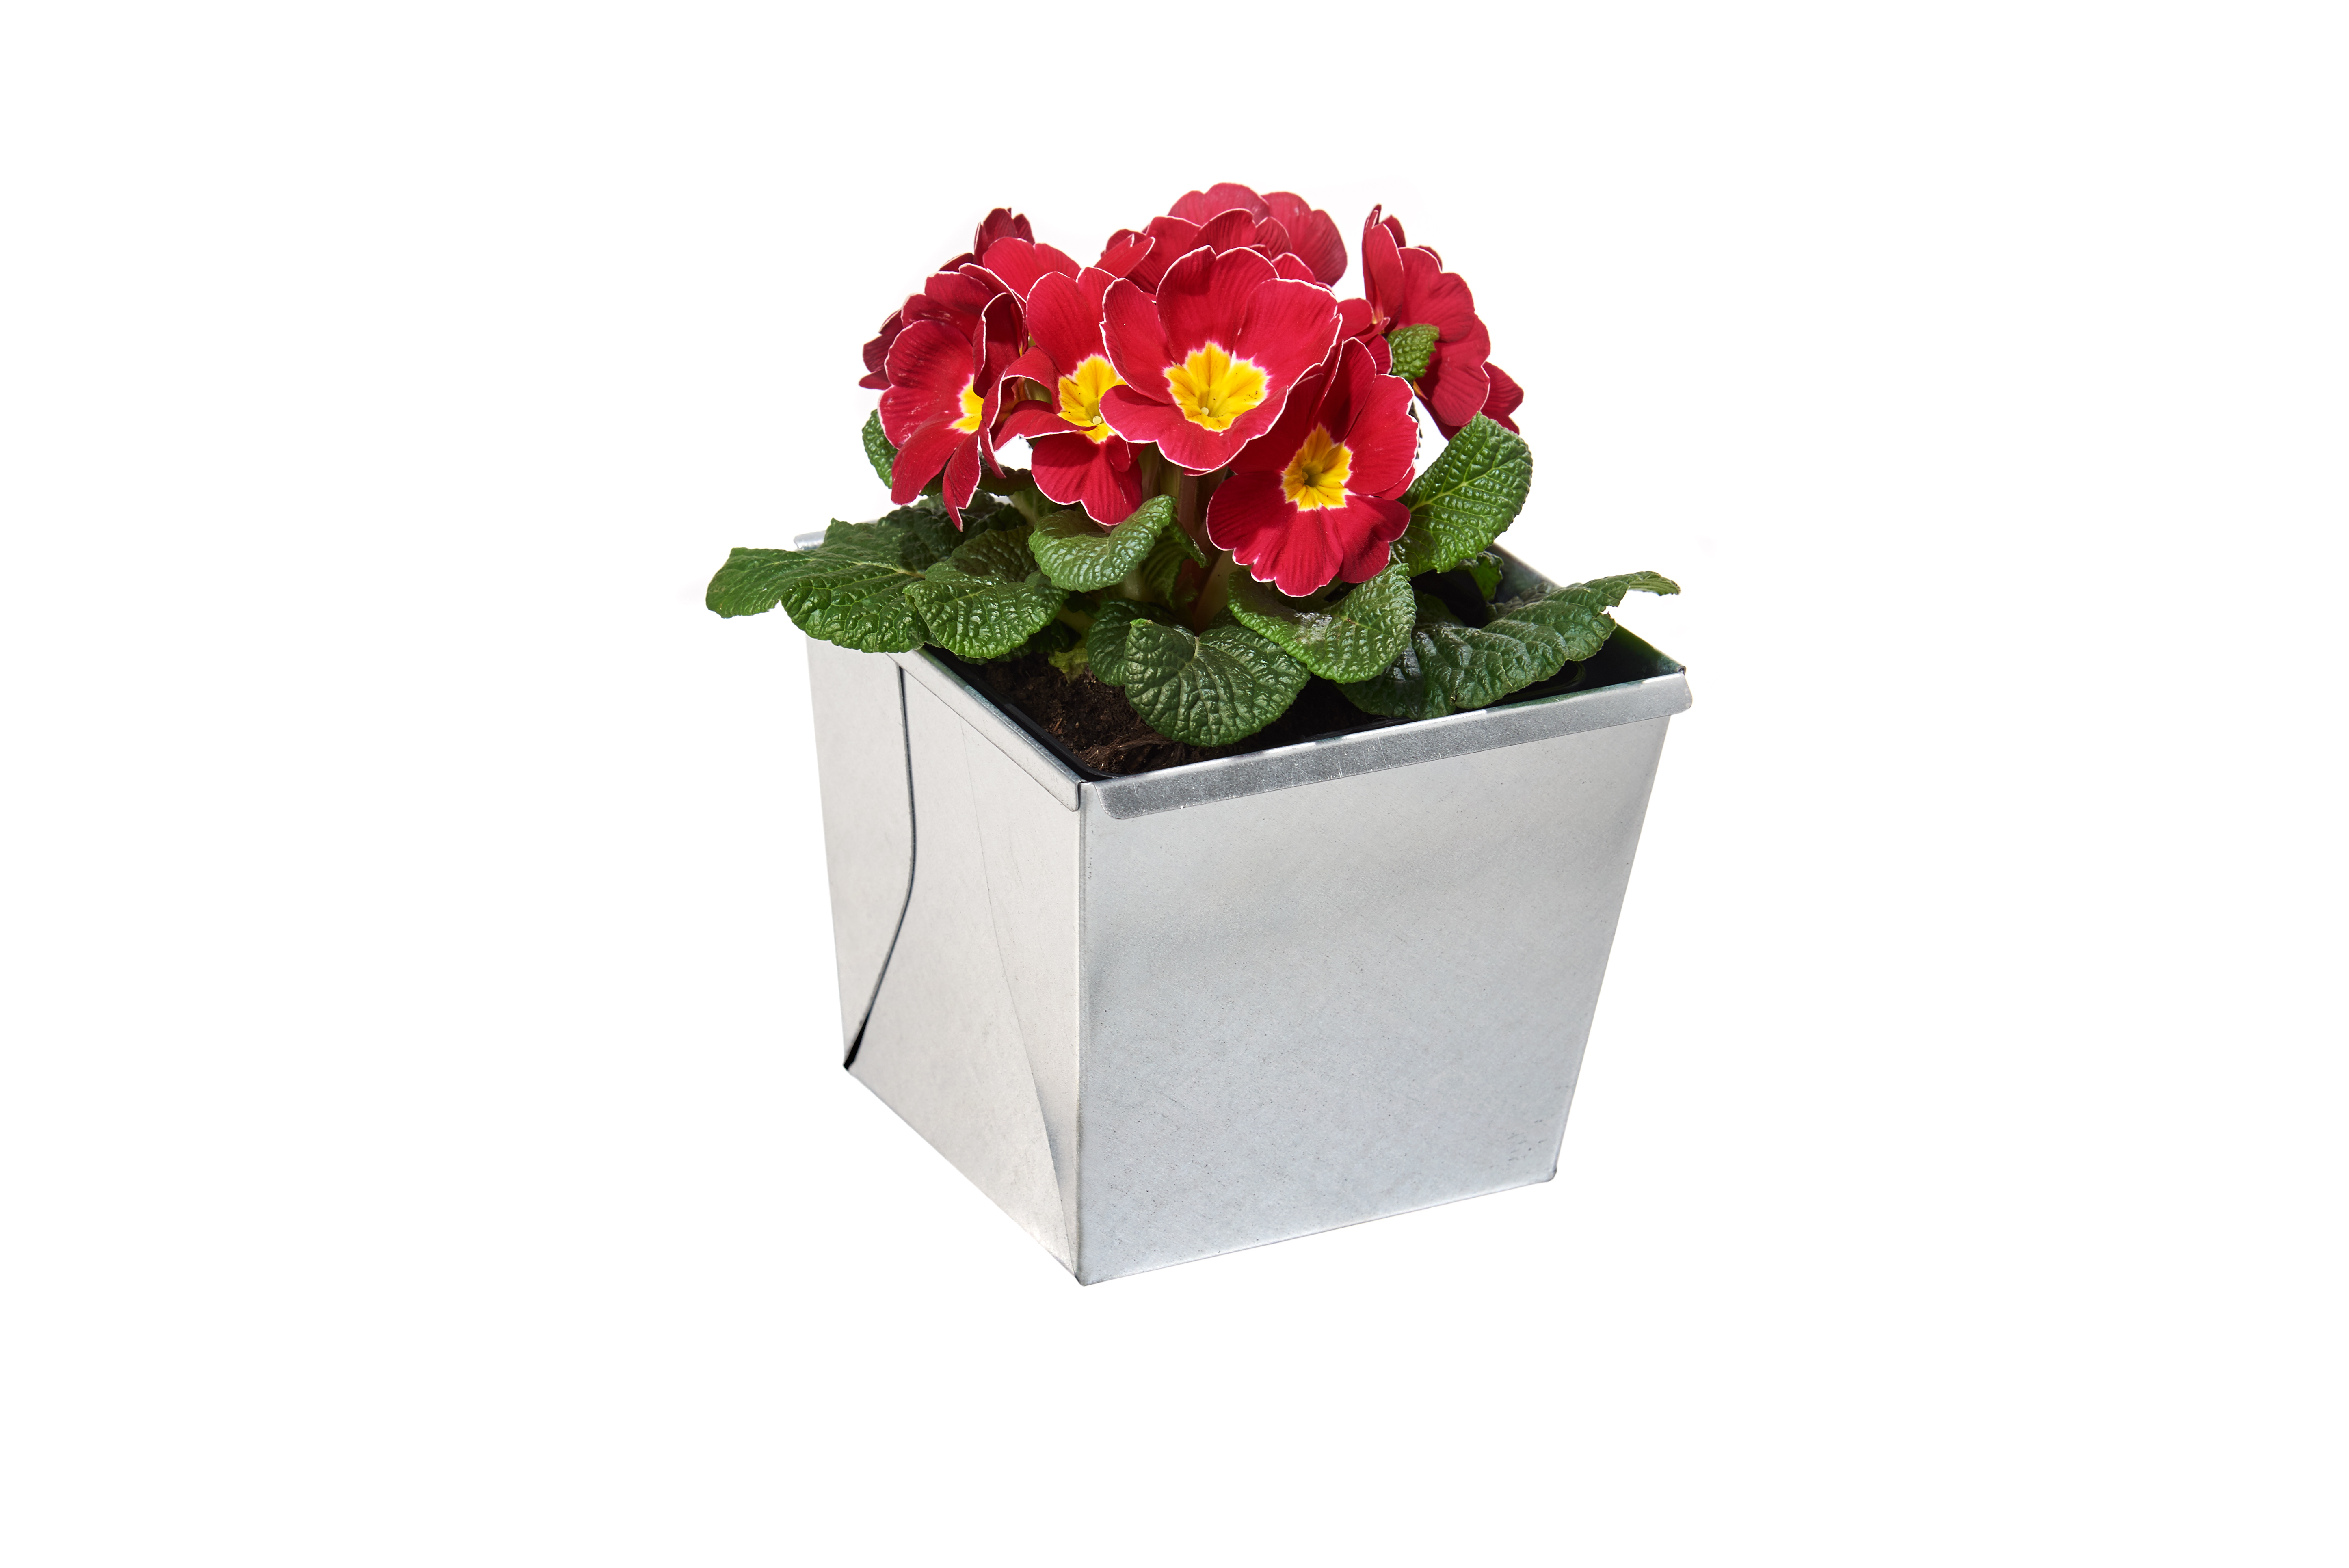 gabioka flowerbox small verzinkt